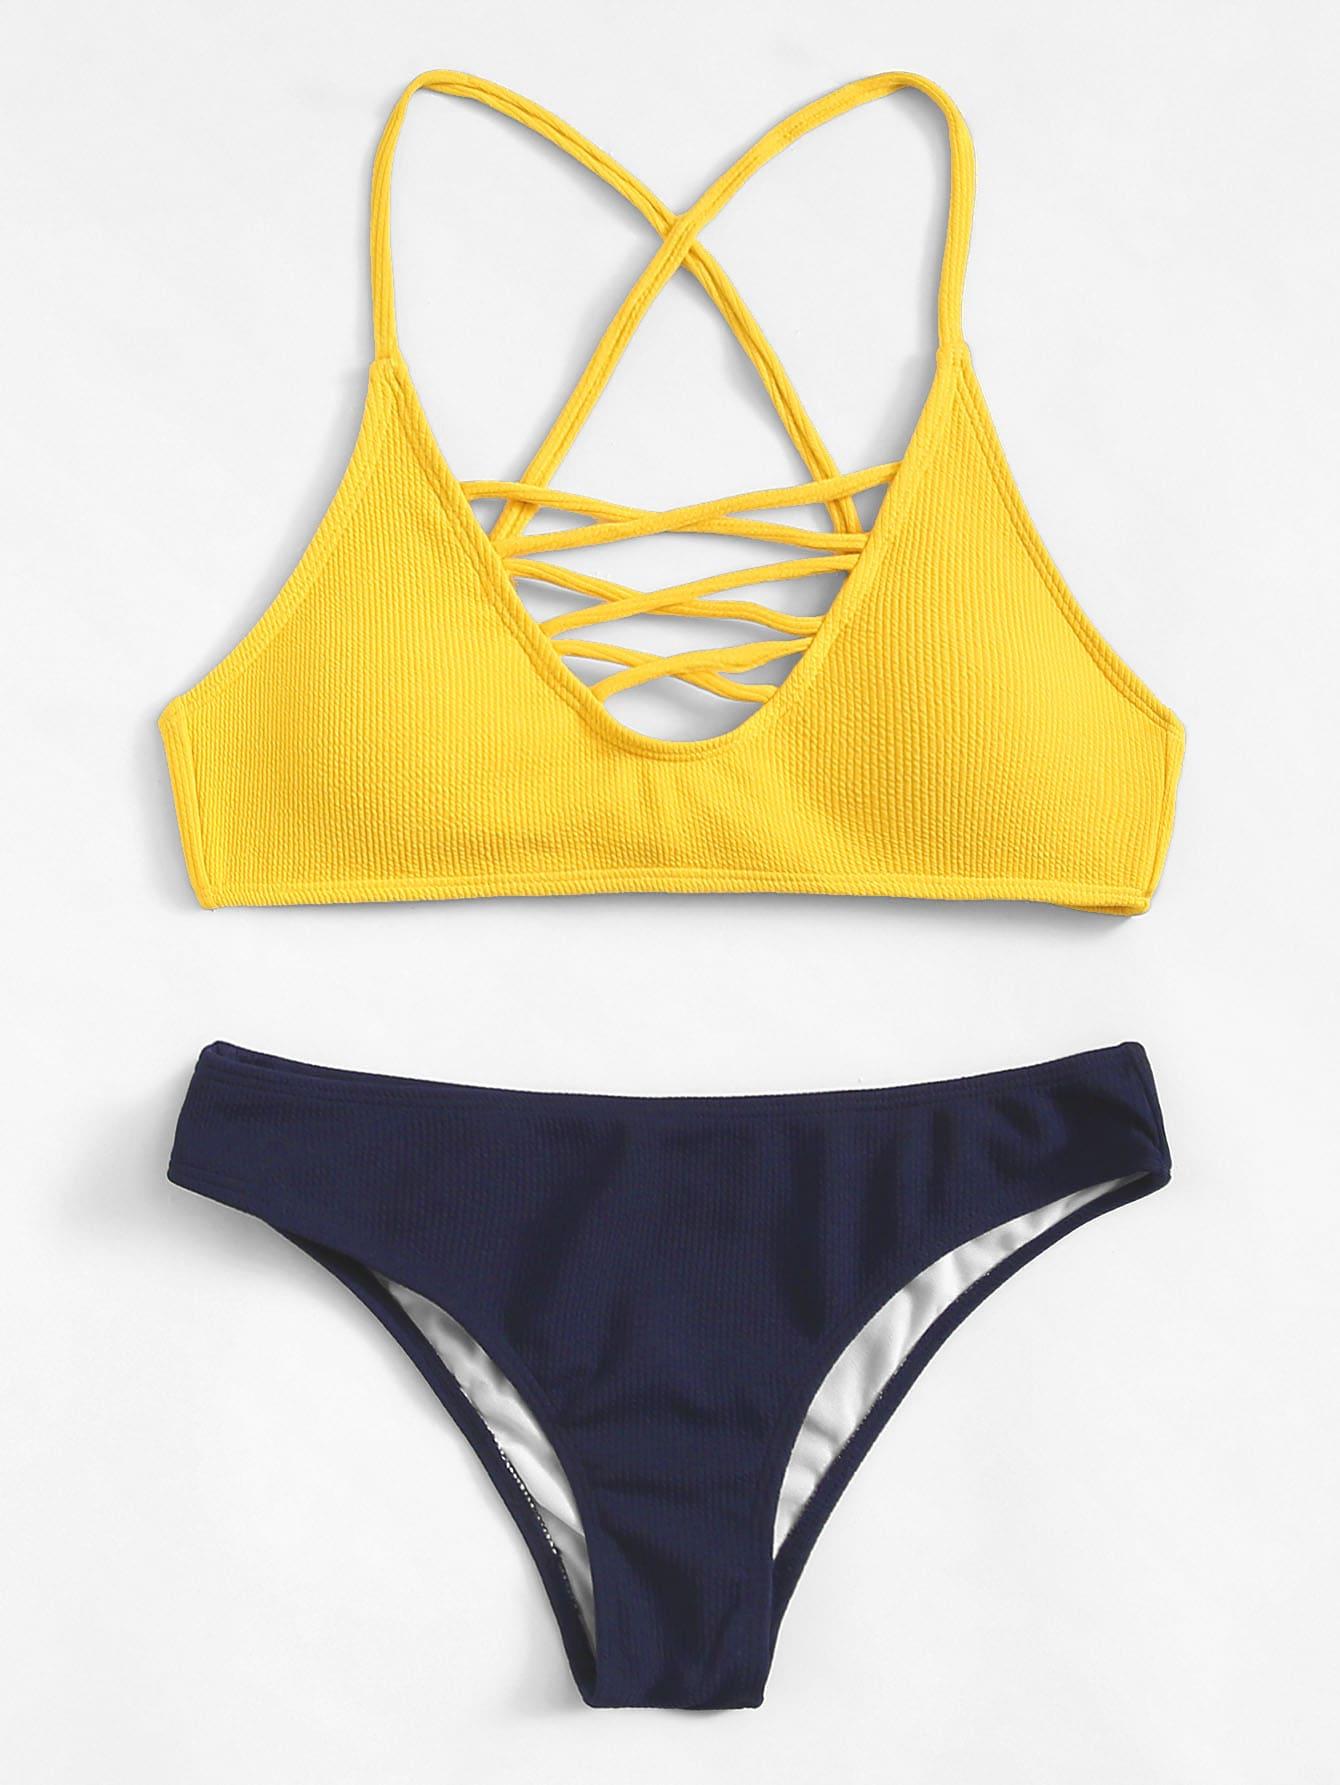 Criss Cross Two Tone Bikini Set